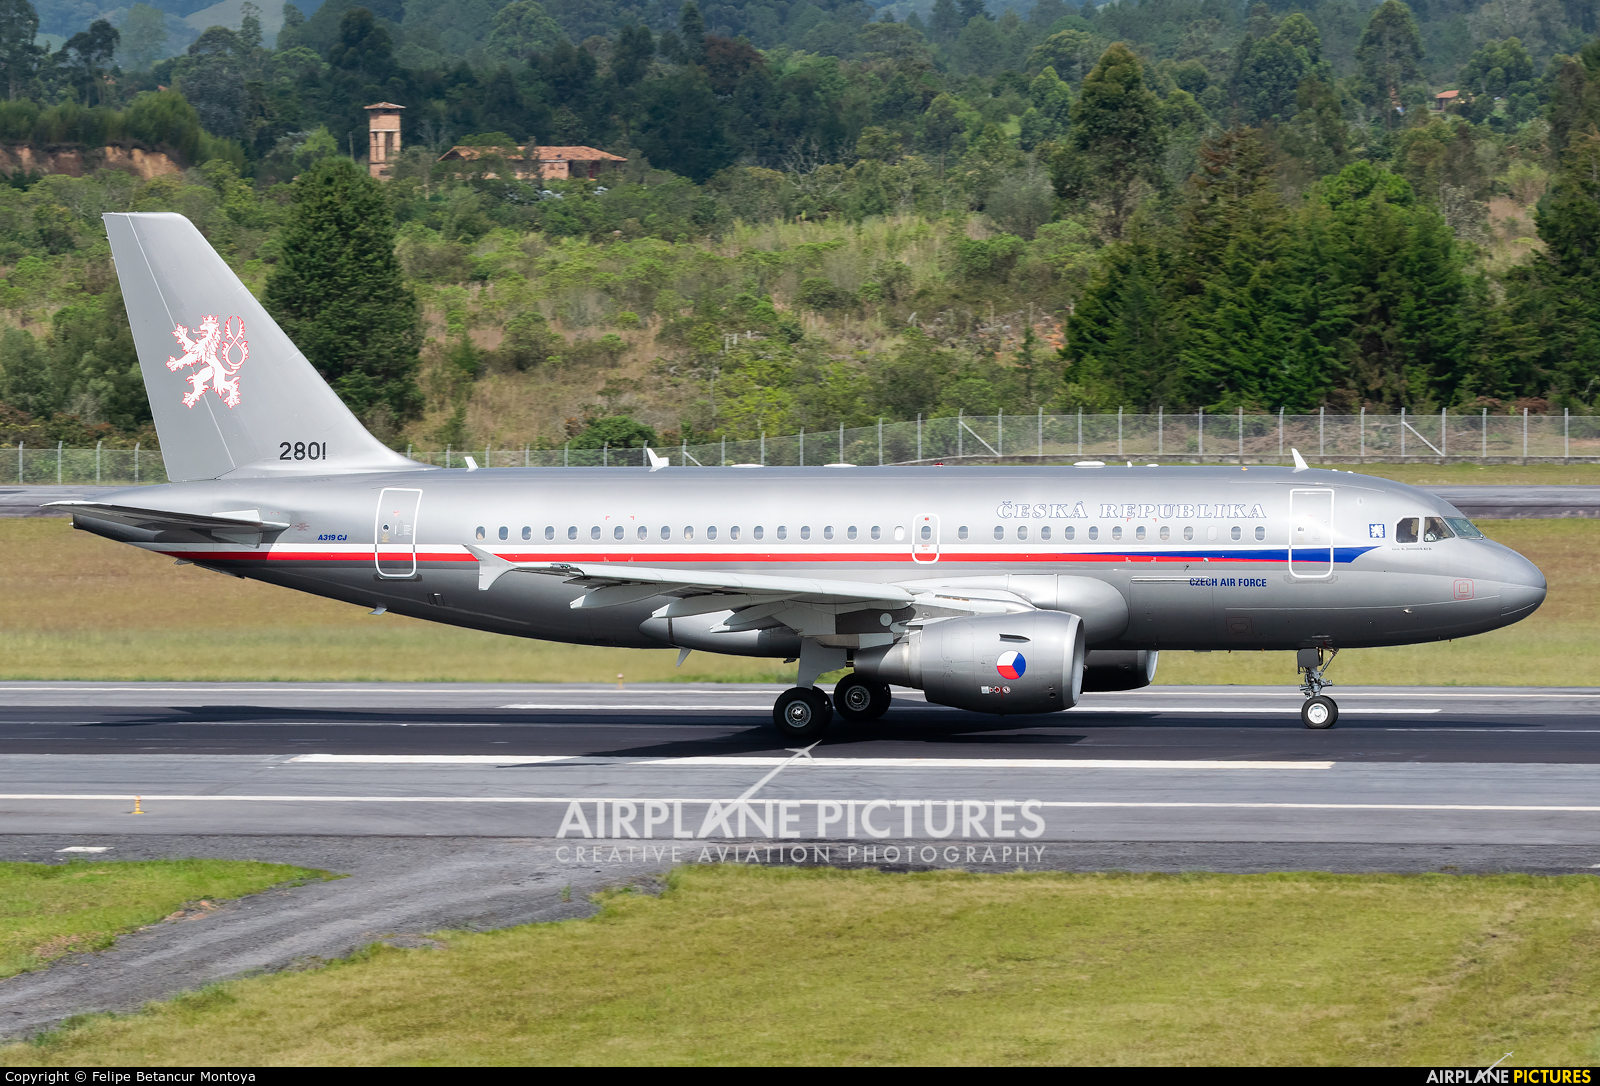 Czech - Air Force 2801 aircraft at Medellin - Jose Maria Cordova Intl